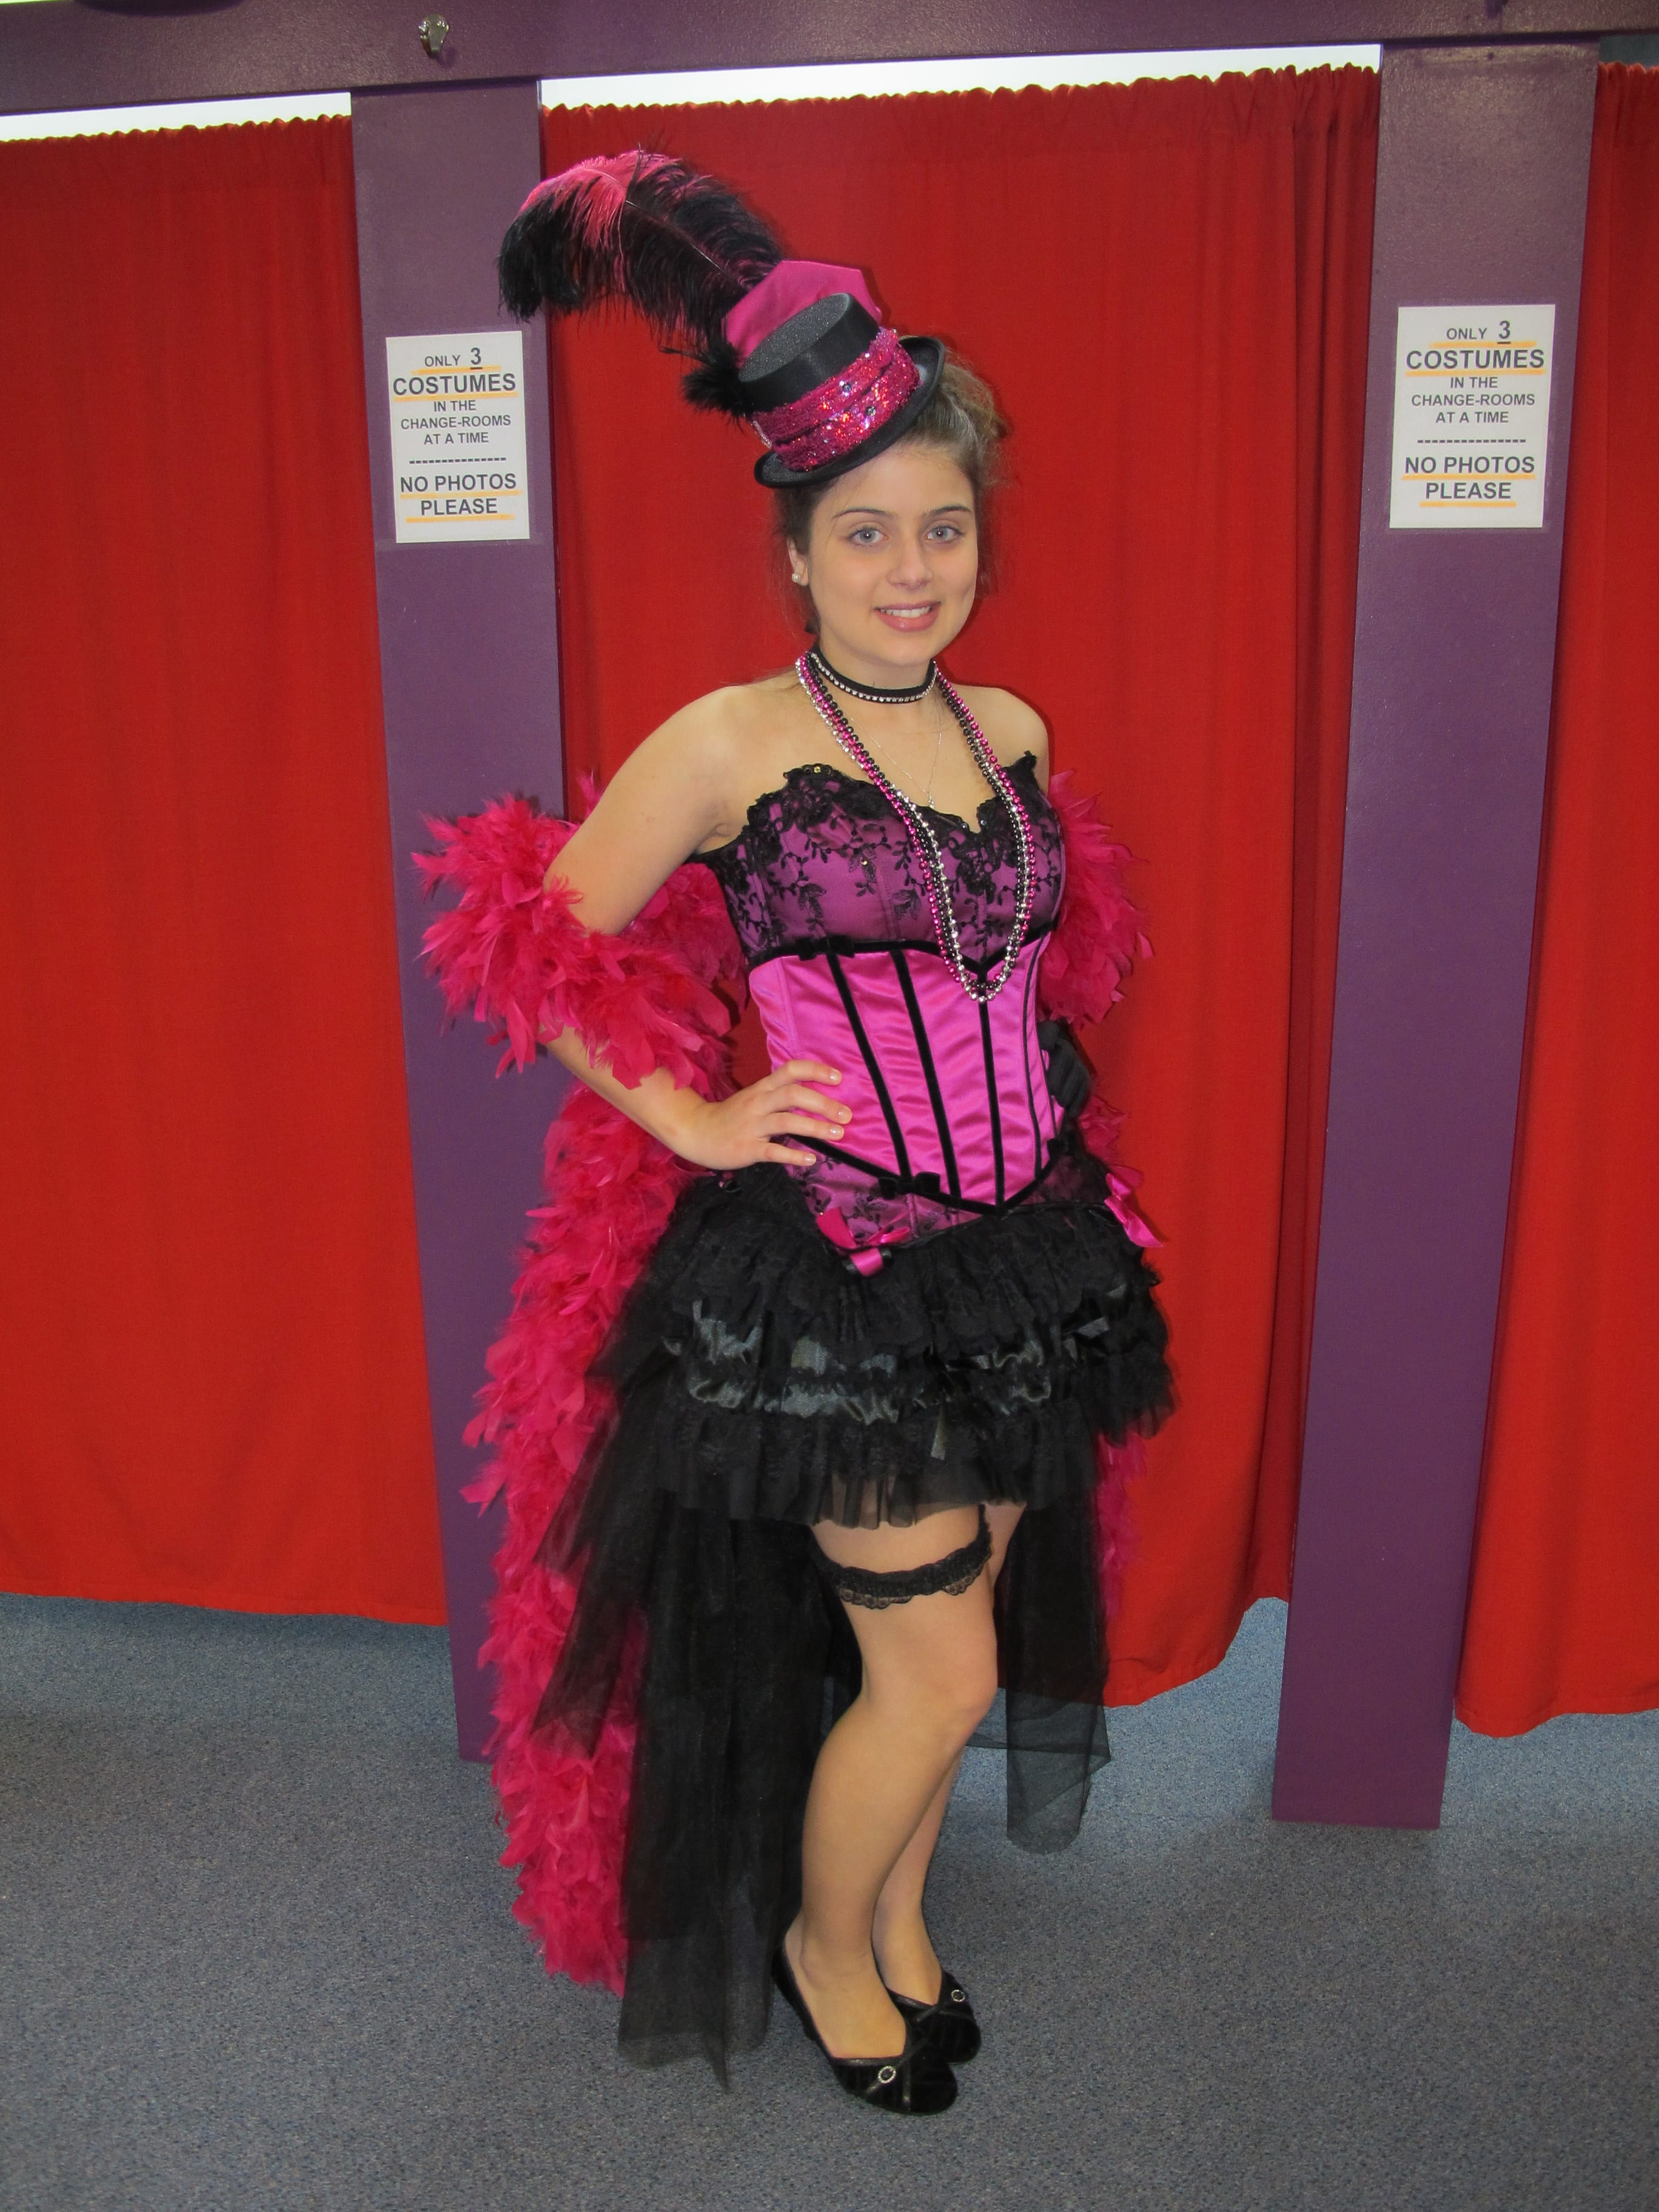 18e043209 Burlesque Costume Hire & Showgirls + Costume Hire | Zoe London Dance